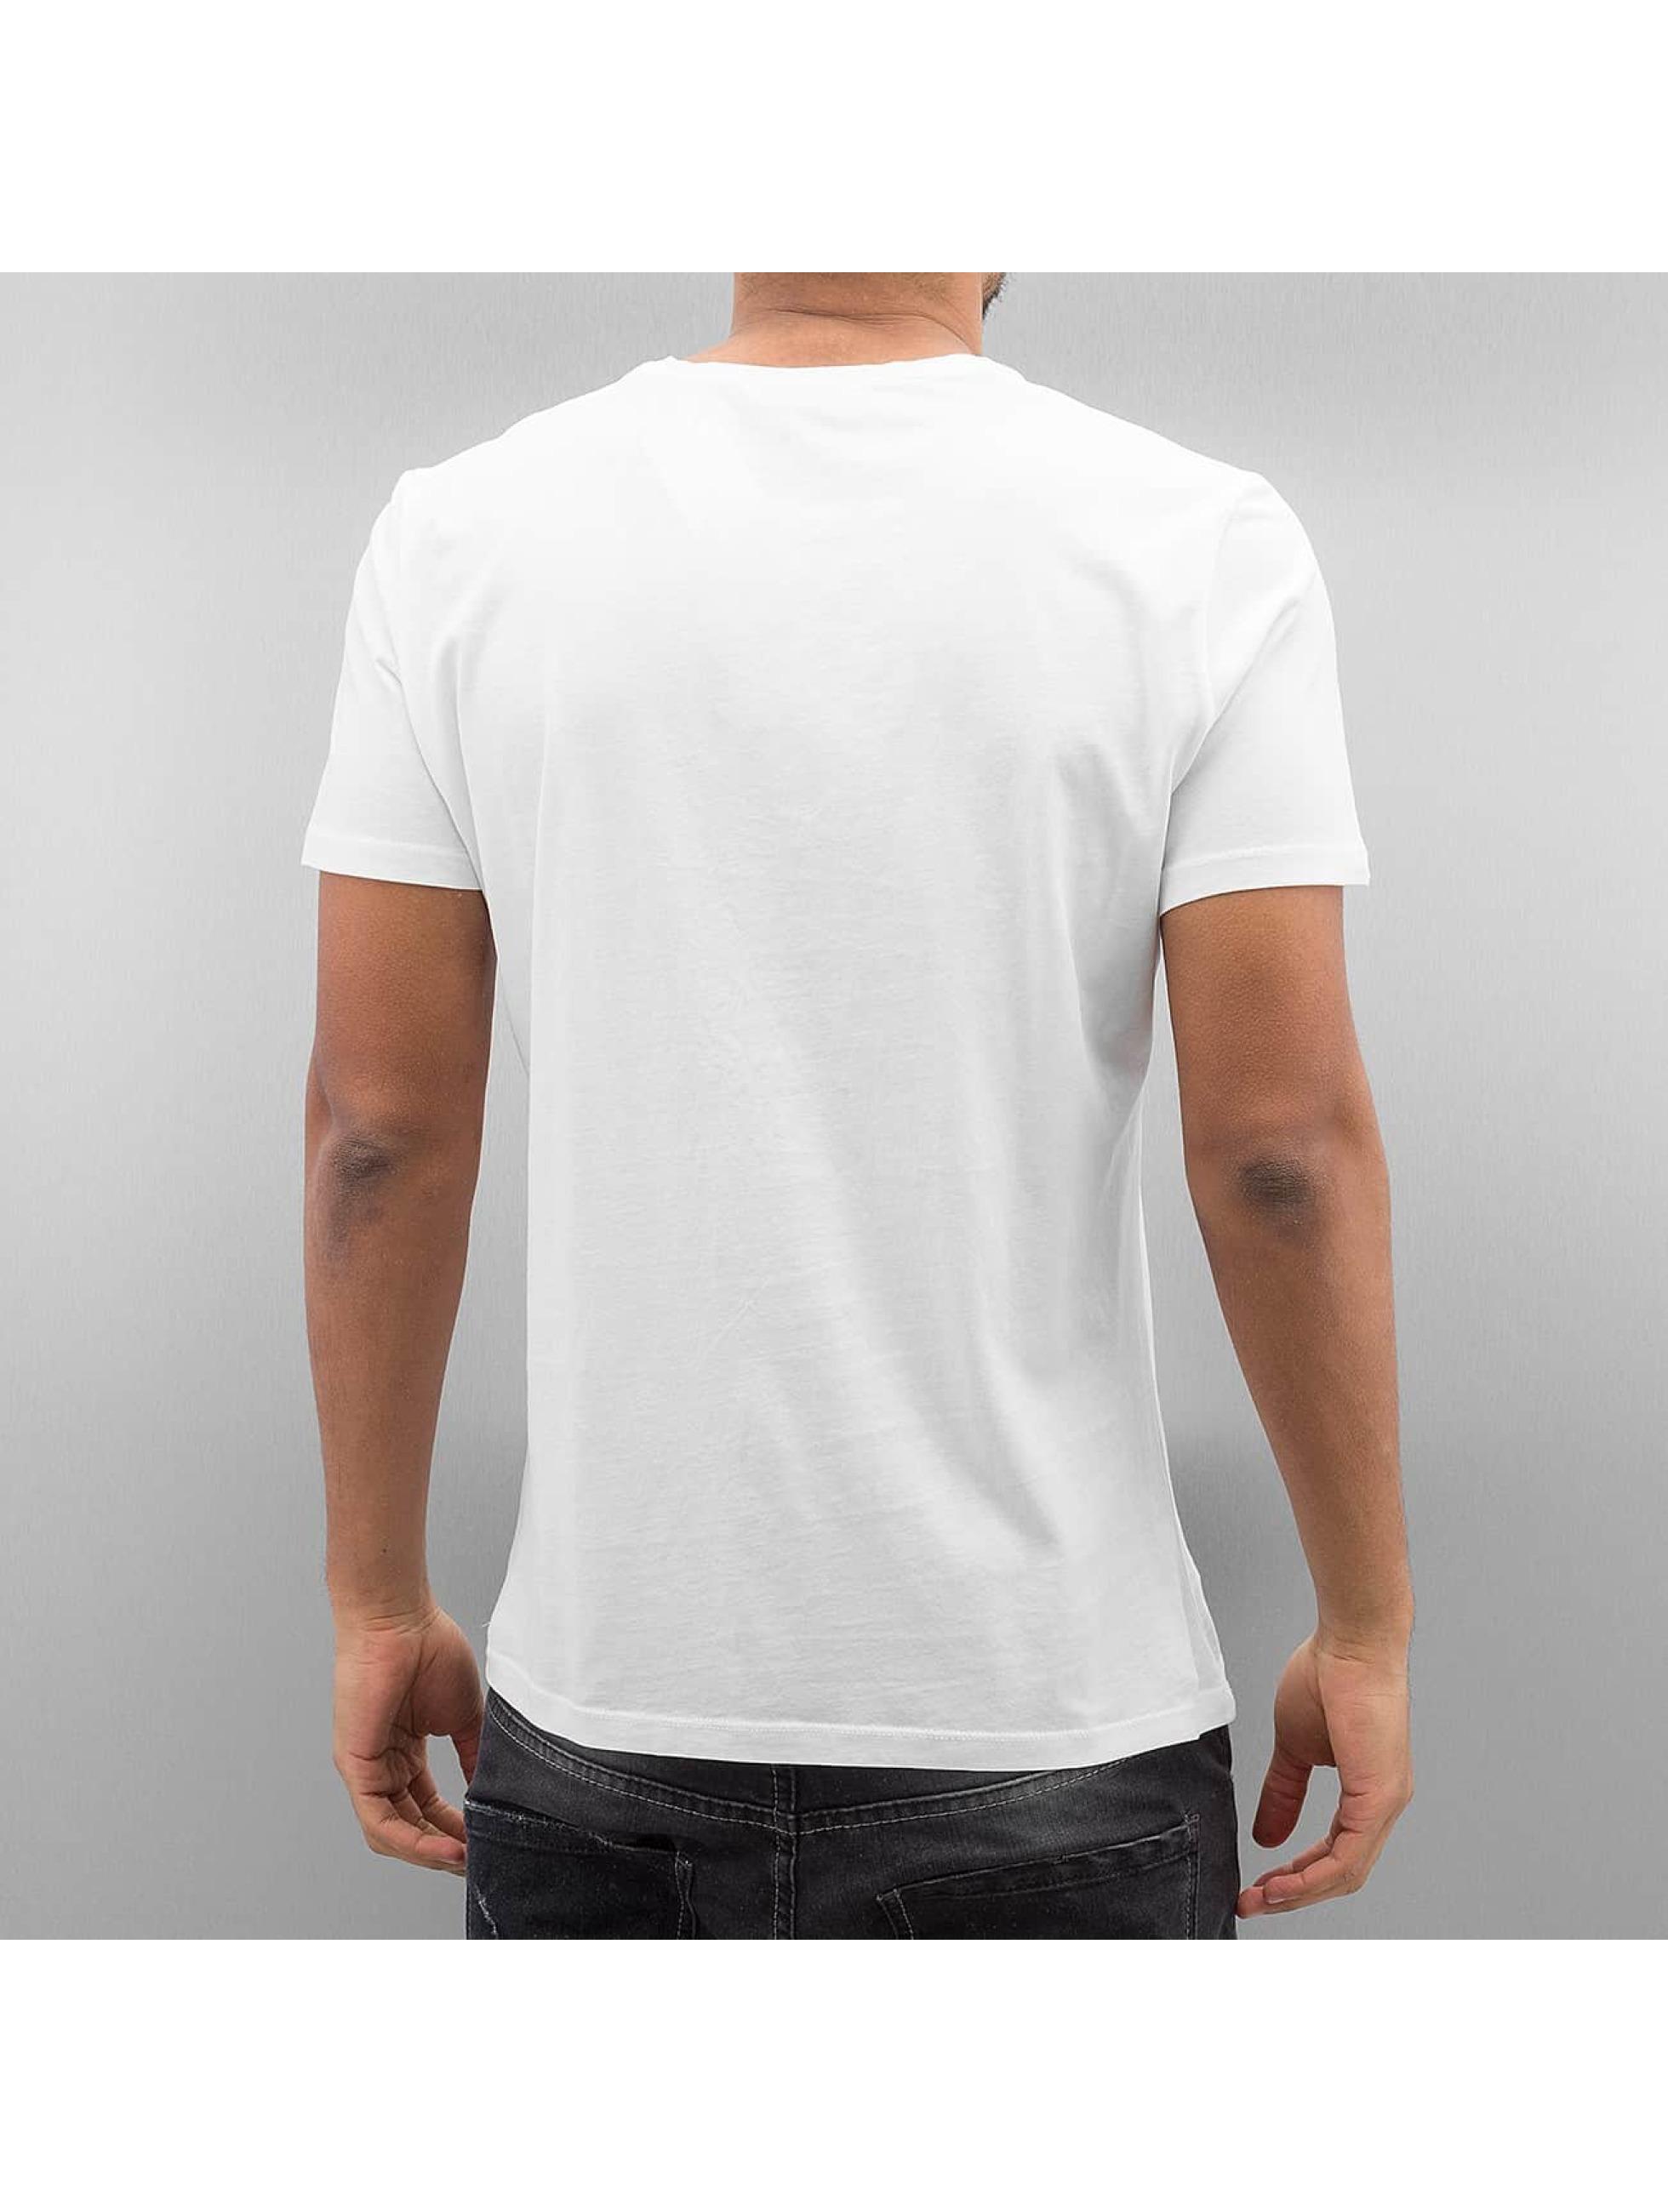 French Kick T-Shirt Yehti white